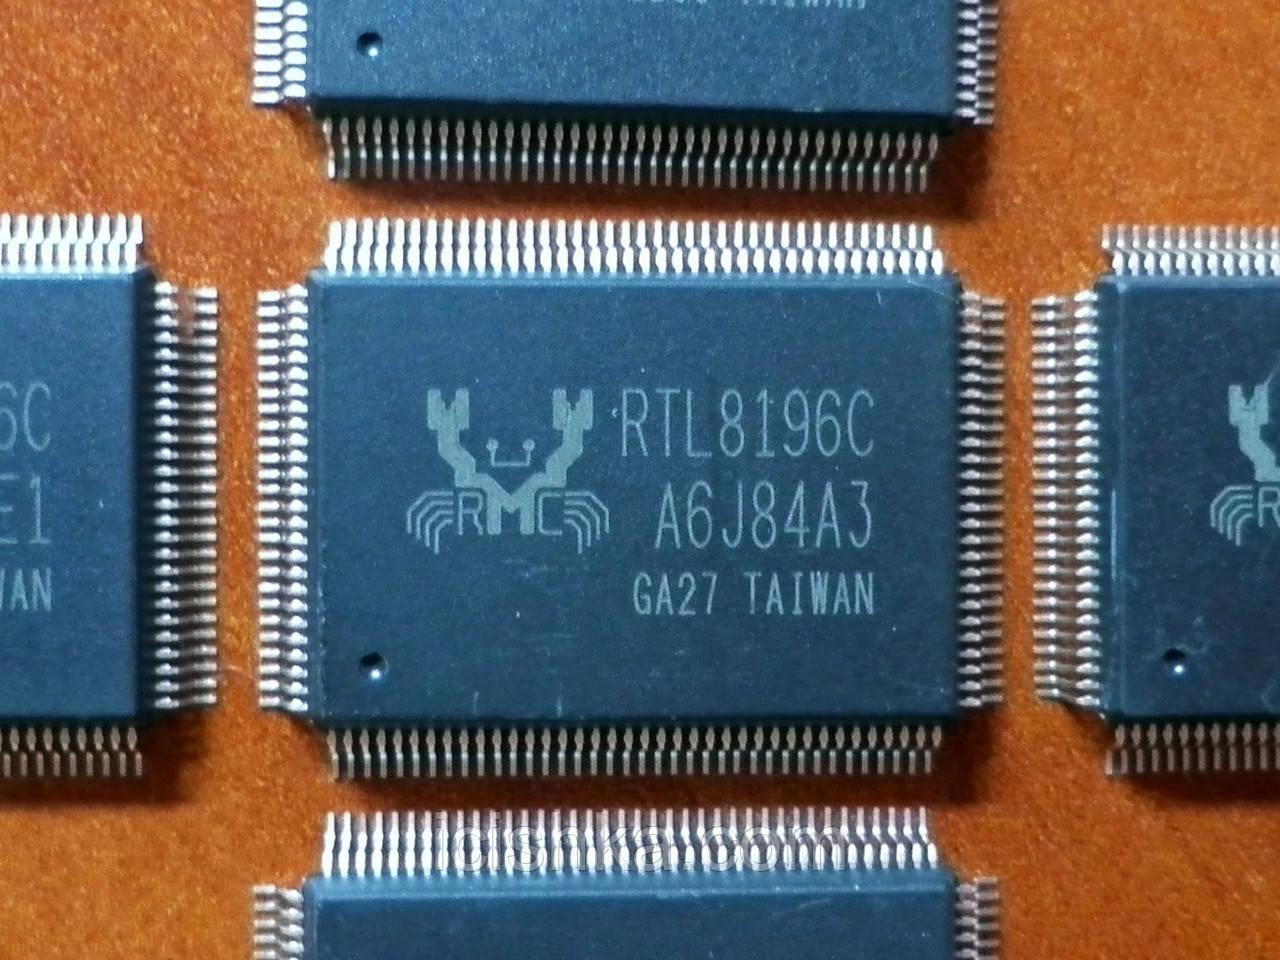 RTL8196C (RTL8196B)  - 802.11n роутер, сетевой процессор EEE